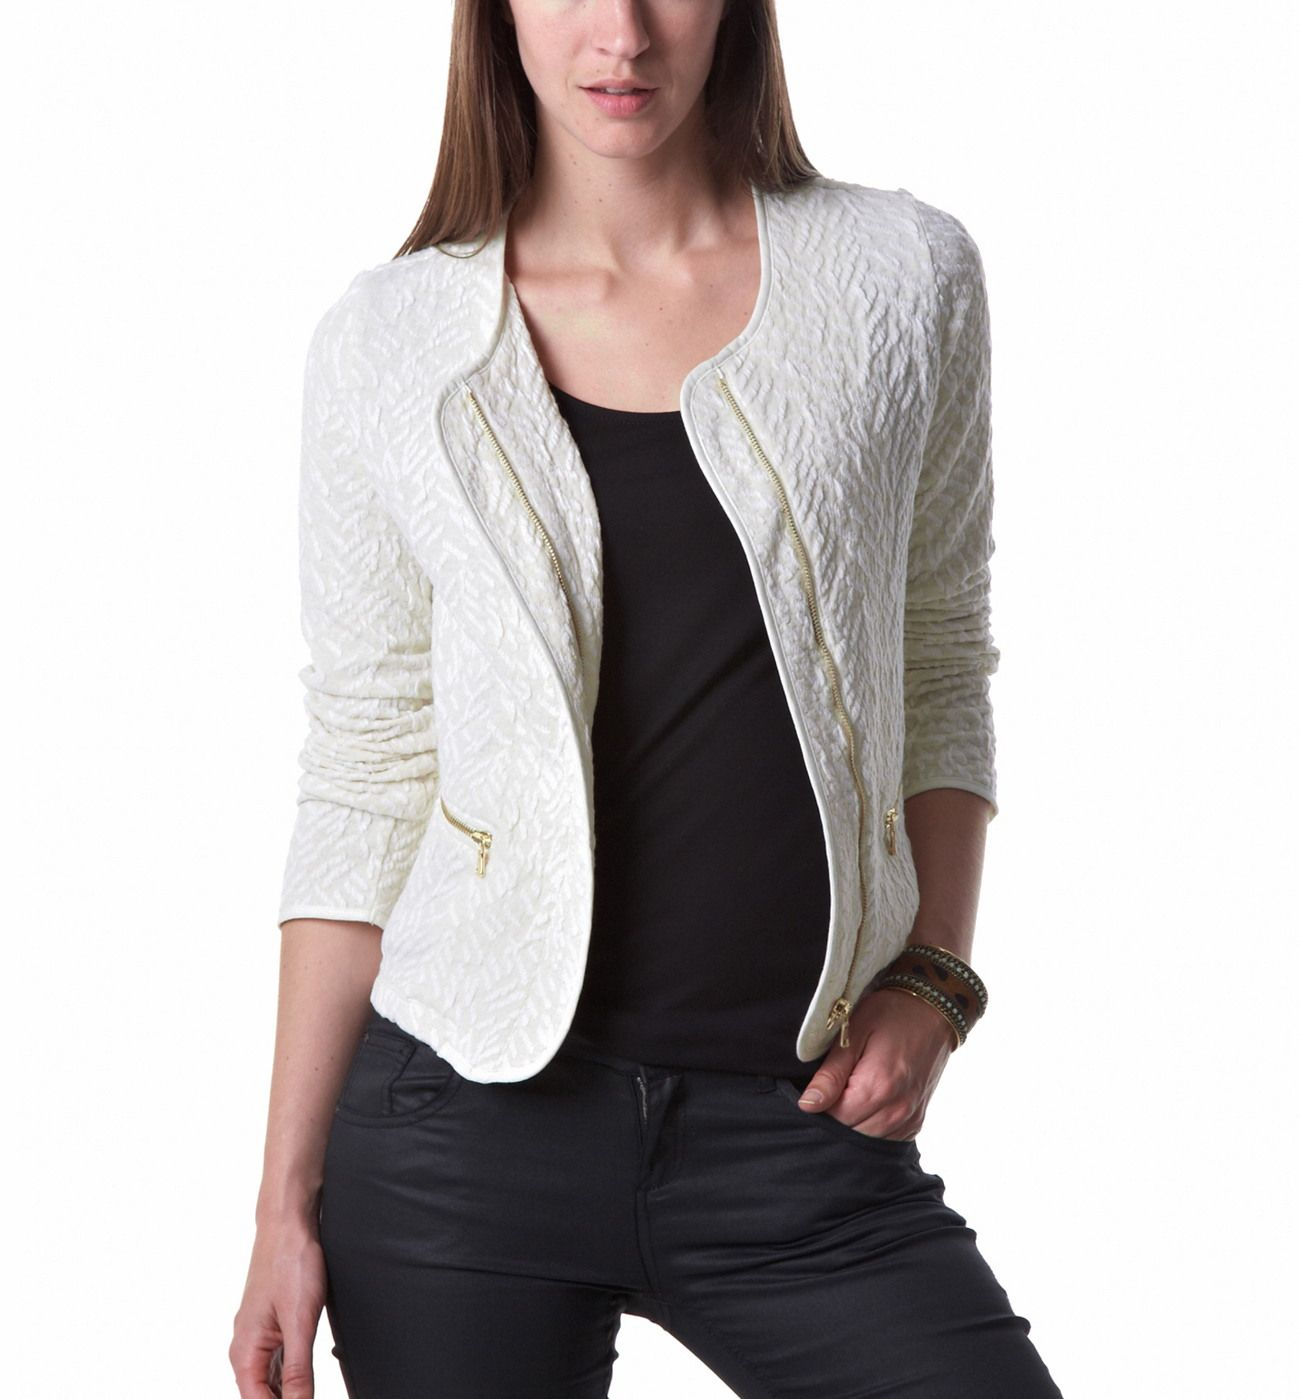 veste zipp e femme ecru vestes blousons femme promod veste pinterest. Black Bedroom Furniture Sets. Home Design Ideas